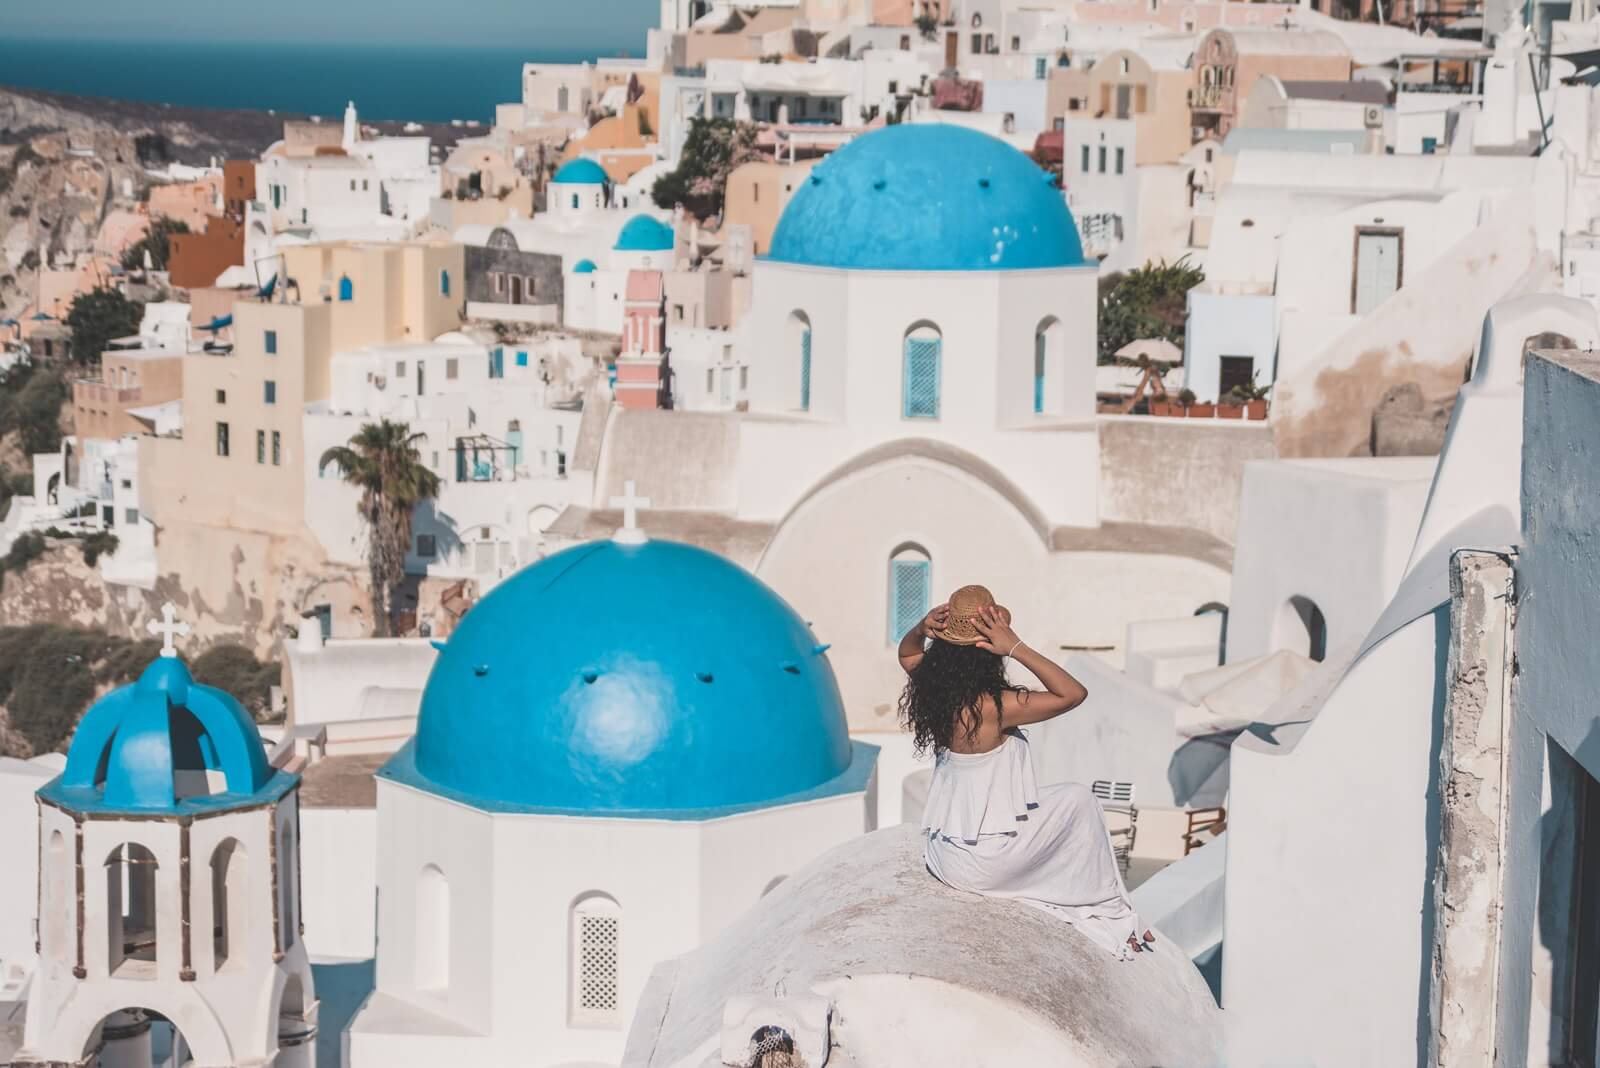 santorini-greece-lavienblog-allrightsreserved3